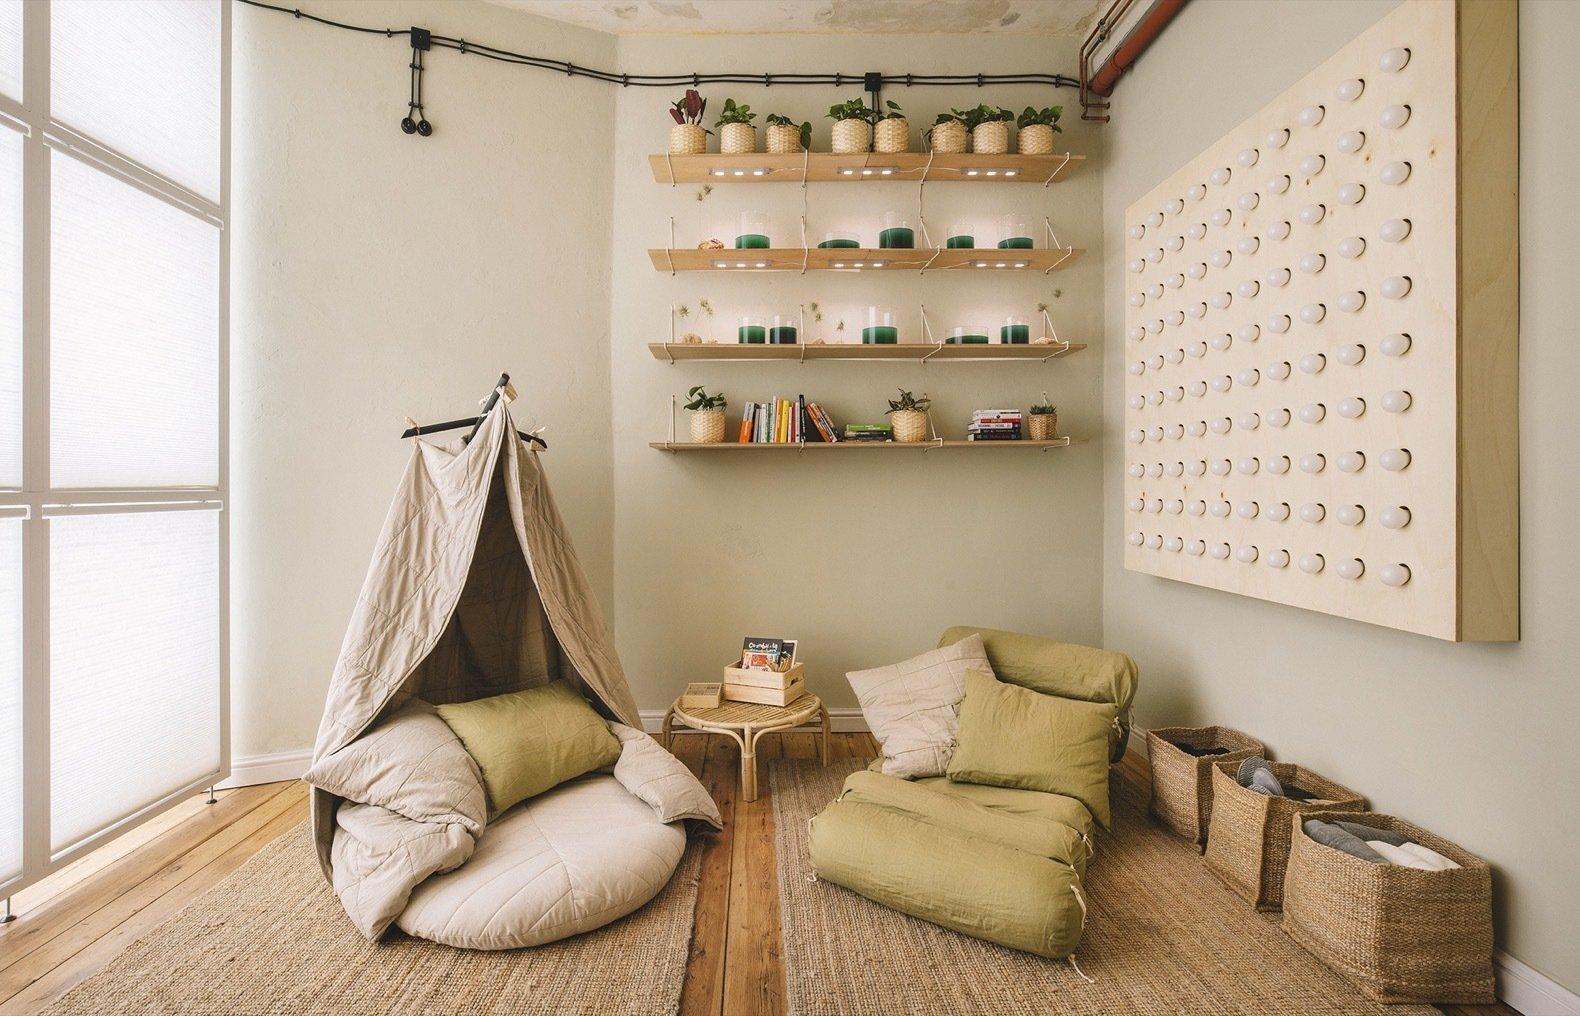 IKEA Home of Tomorrow relax zone